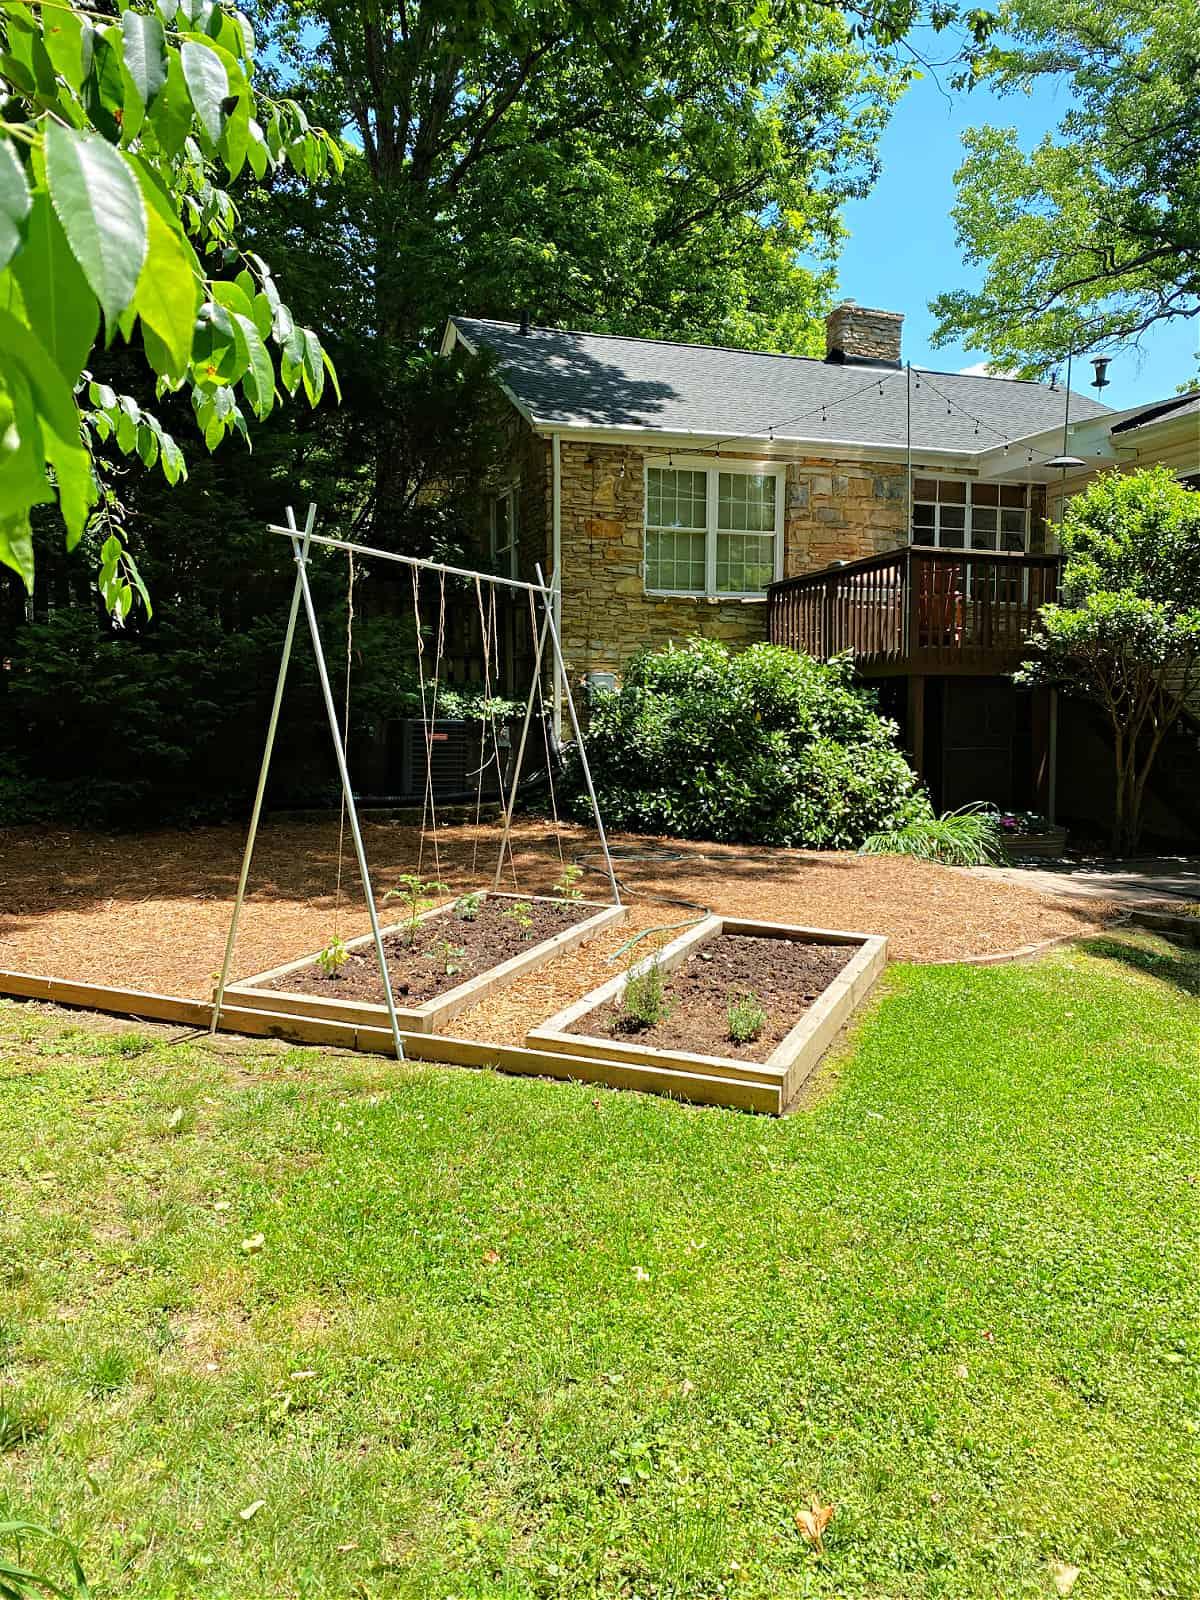 DIY tomato trellis set up in garden